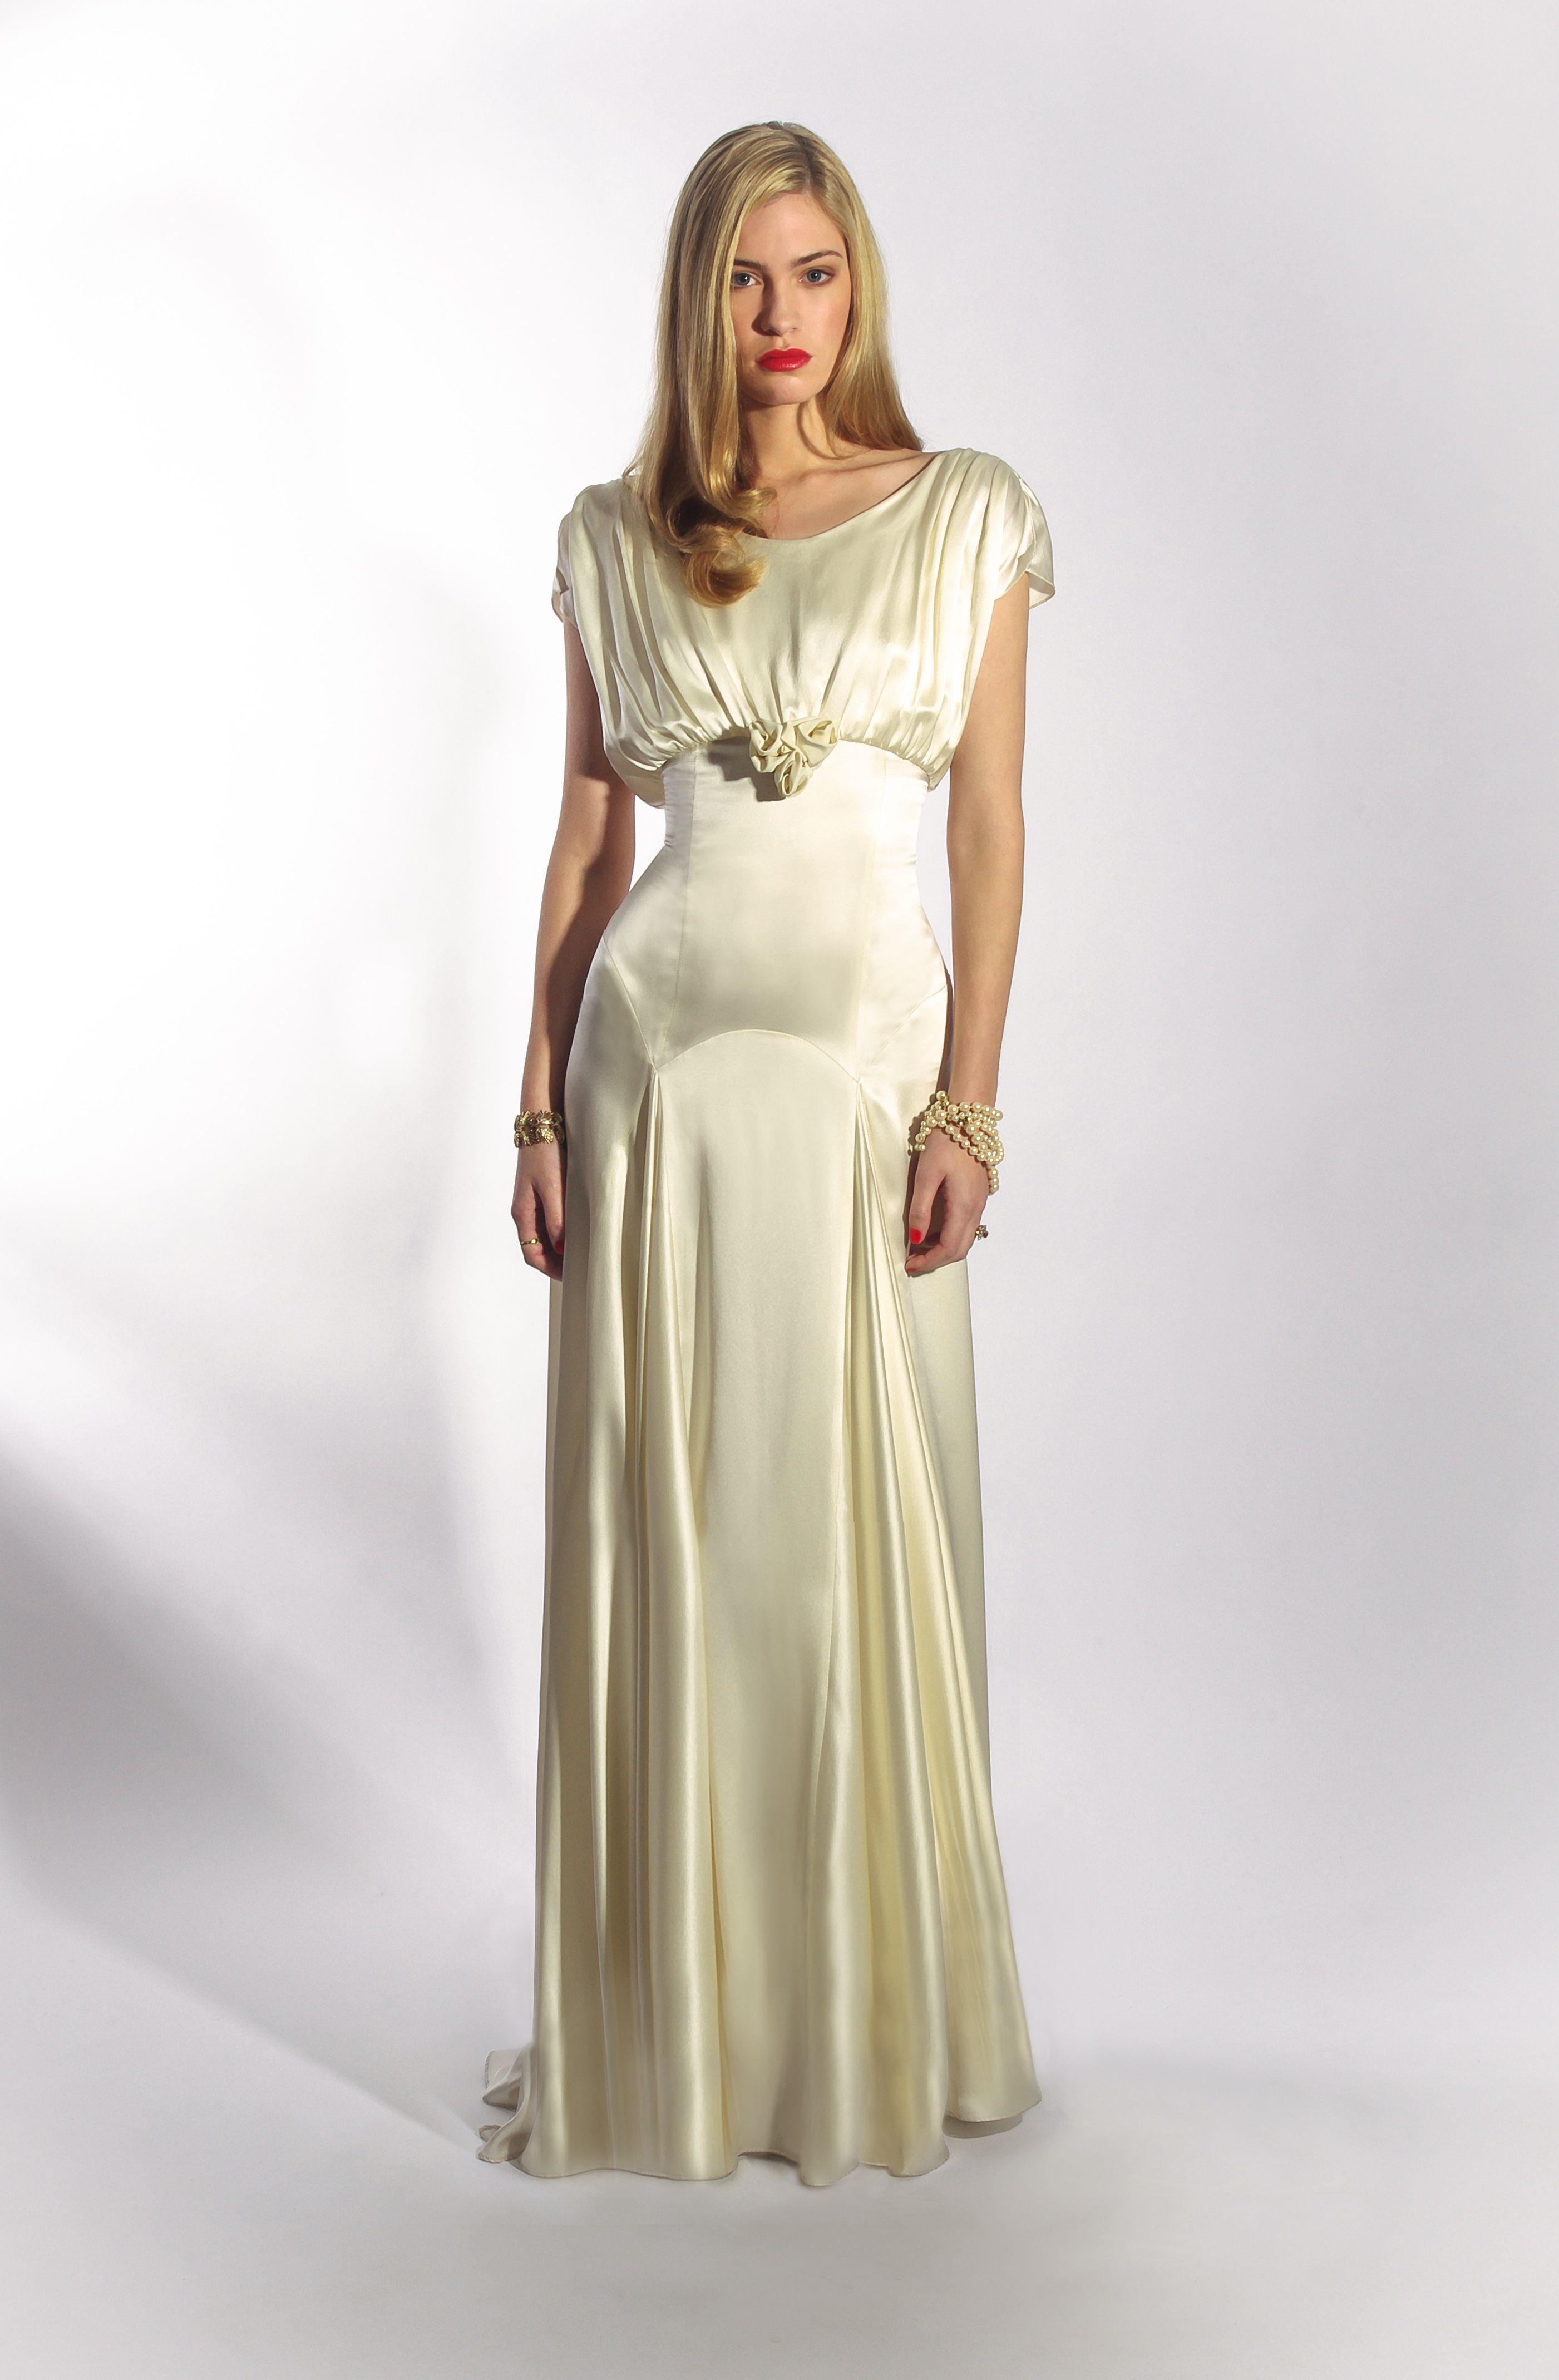 The Belle dress by Belle & Bunty UK - 1930s liquid satin old ...